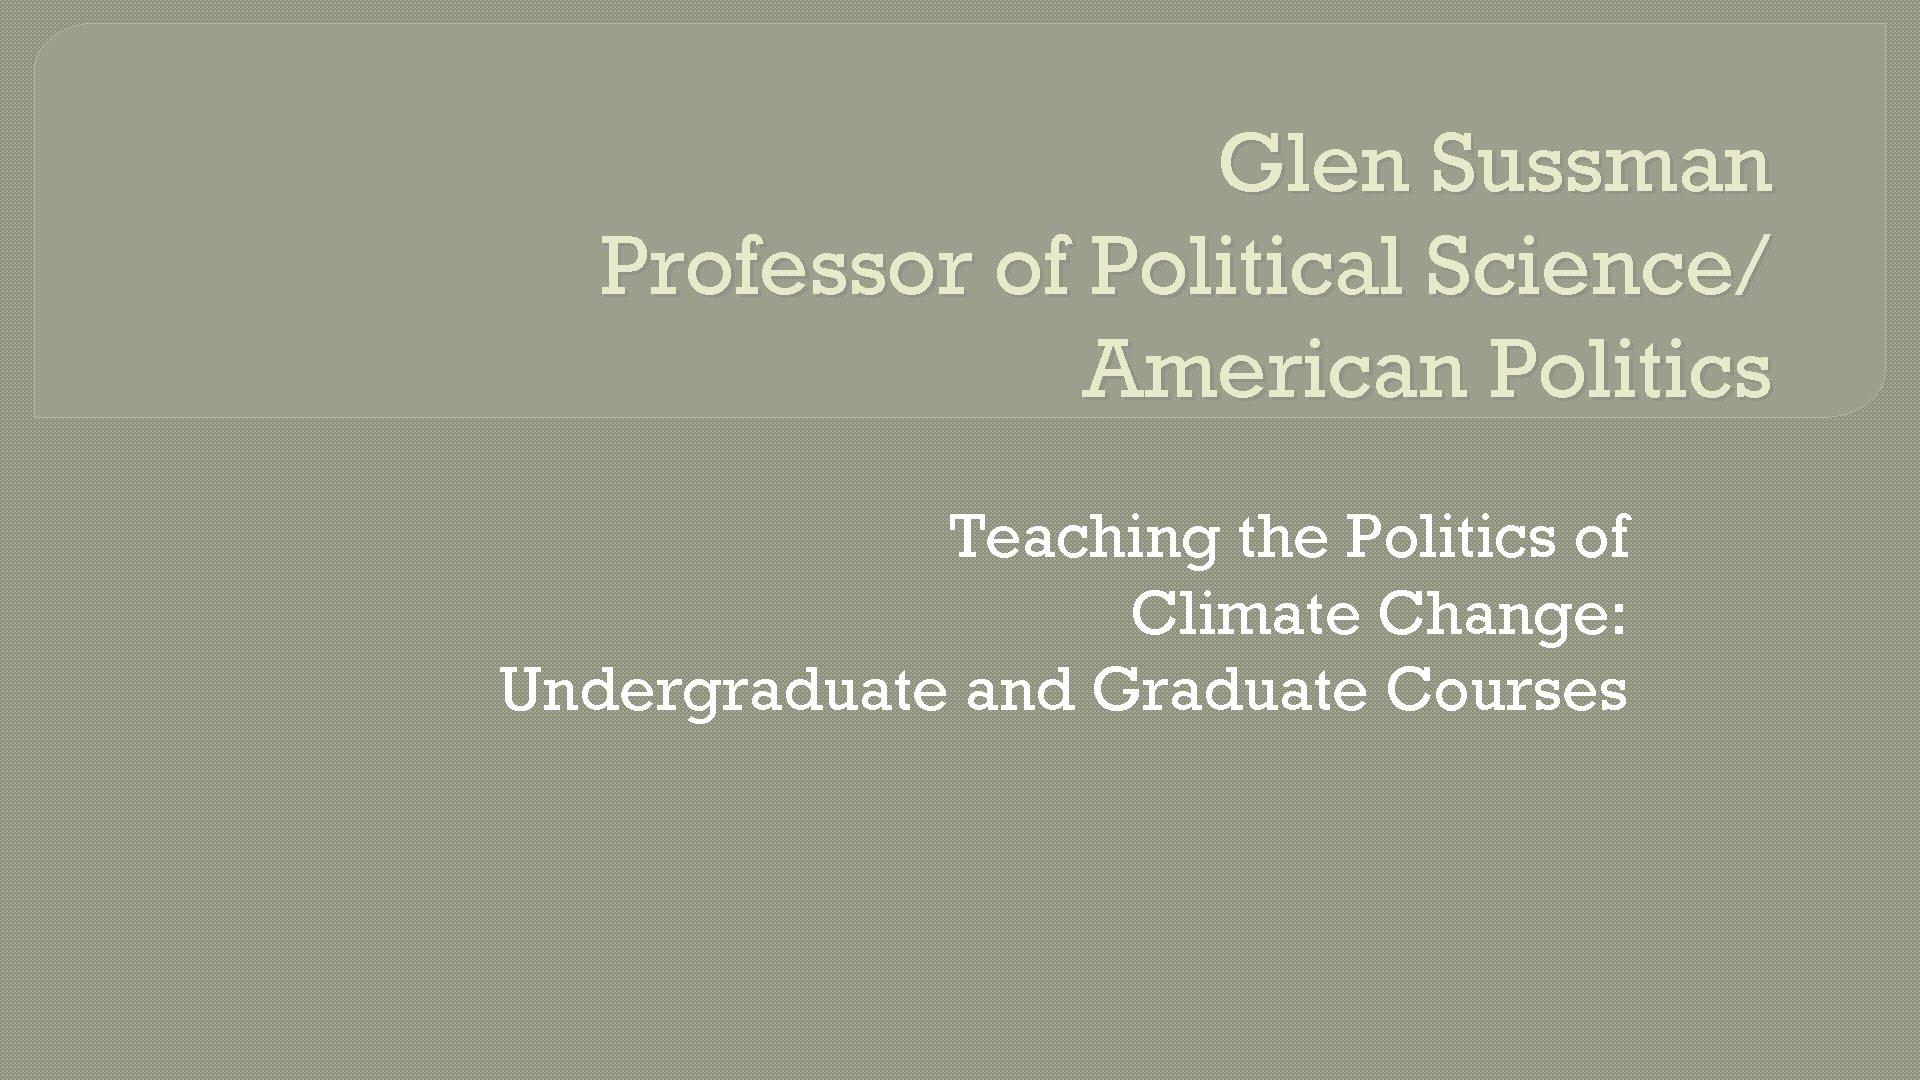 Glen Sussman Professor of Political Science/ American Politics Teaching the Politics of Climate Change: